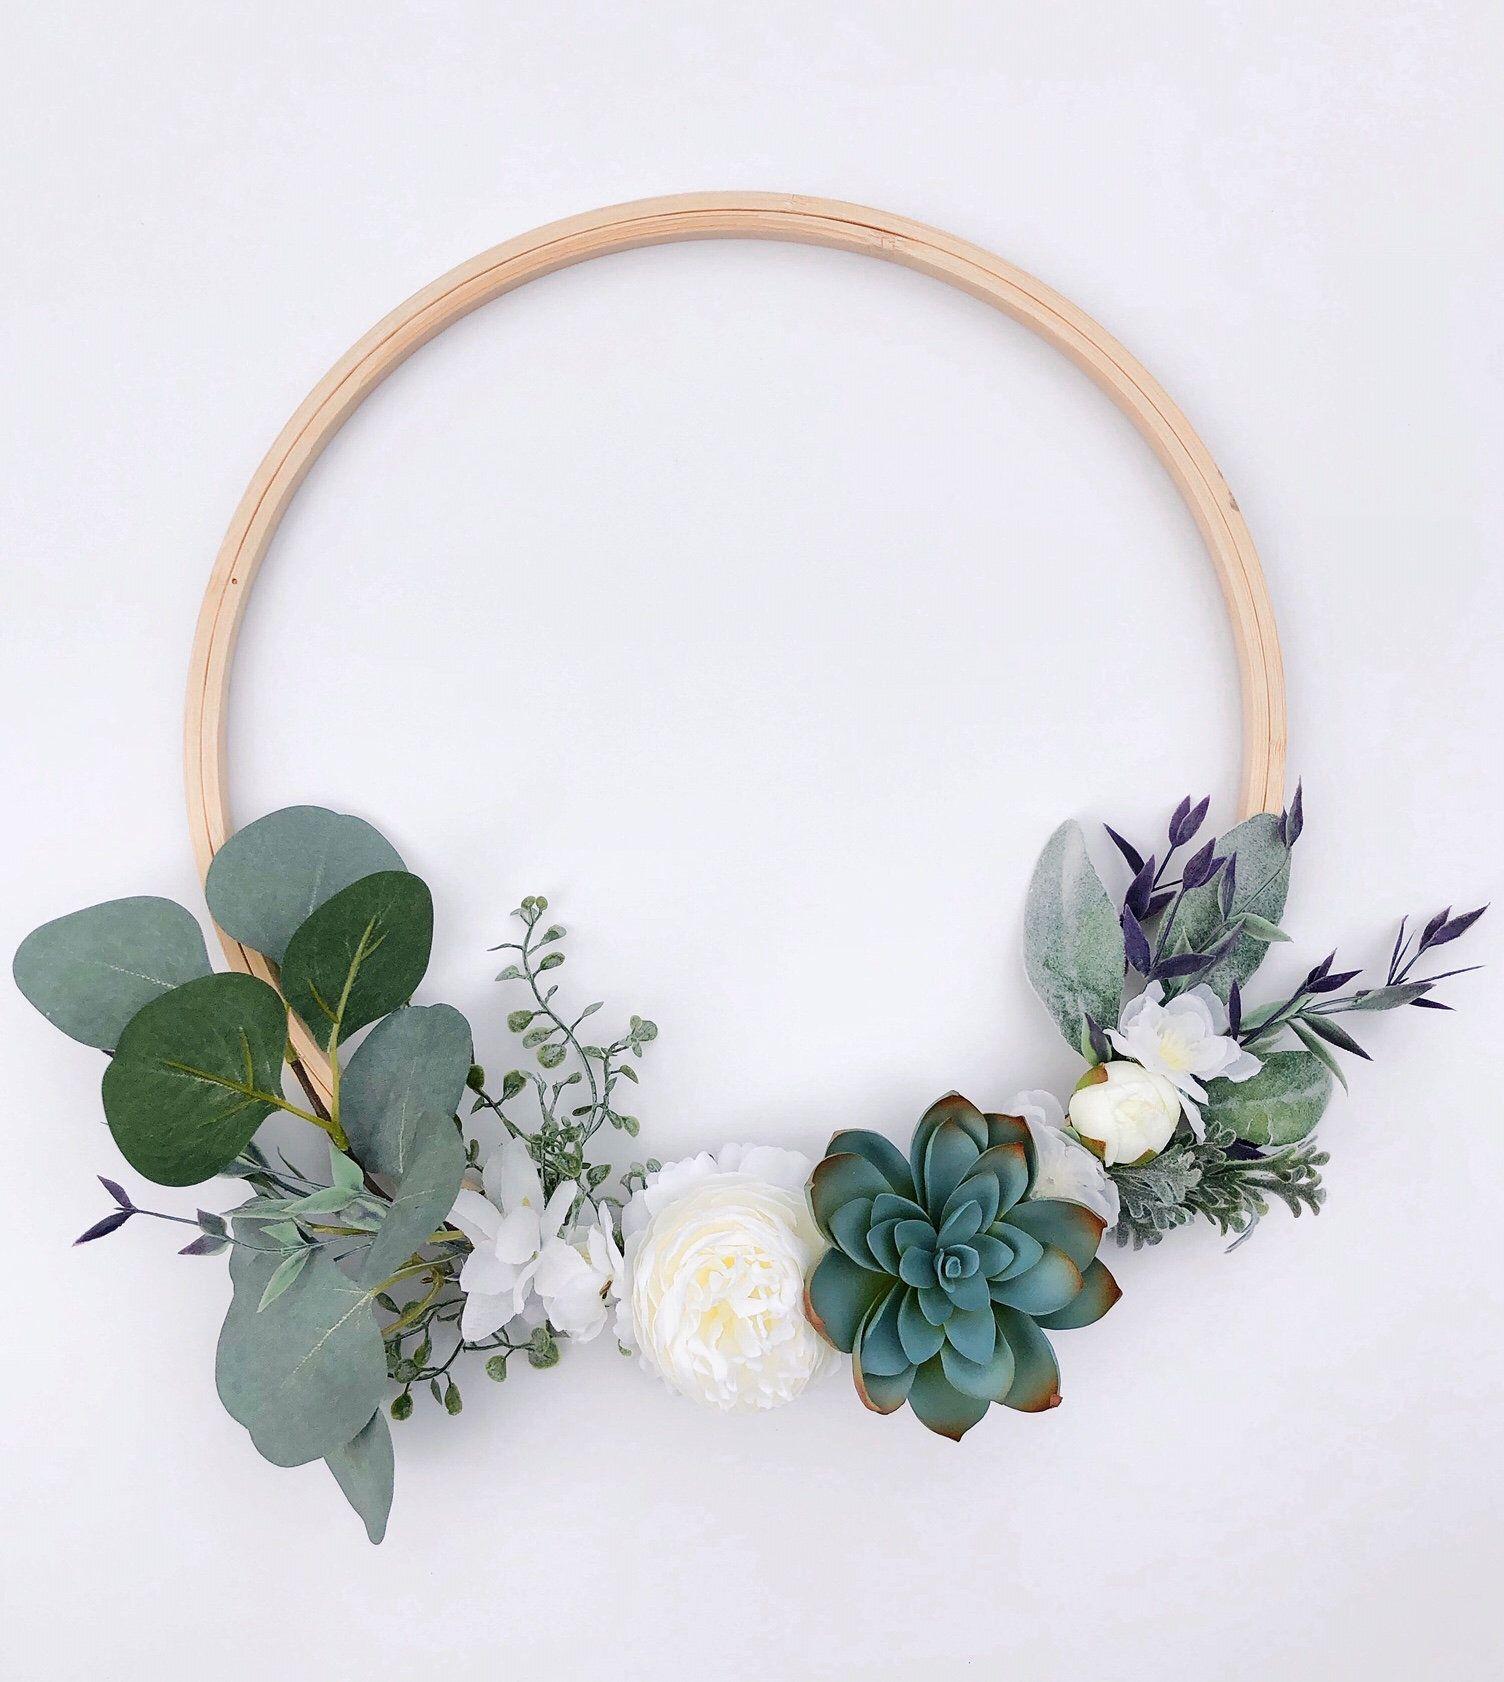 Photo of Succulent hoop wreath, Succulent Wreath, Green, purple and white spring wreath, Minimal hoop wreath, Boho wedding hoop bouquet